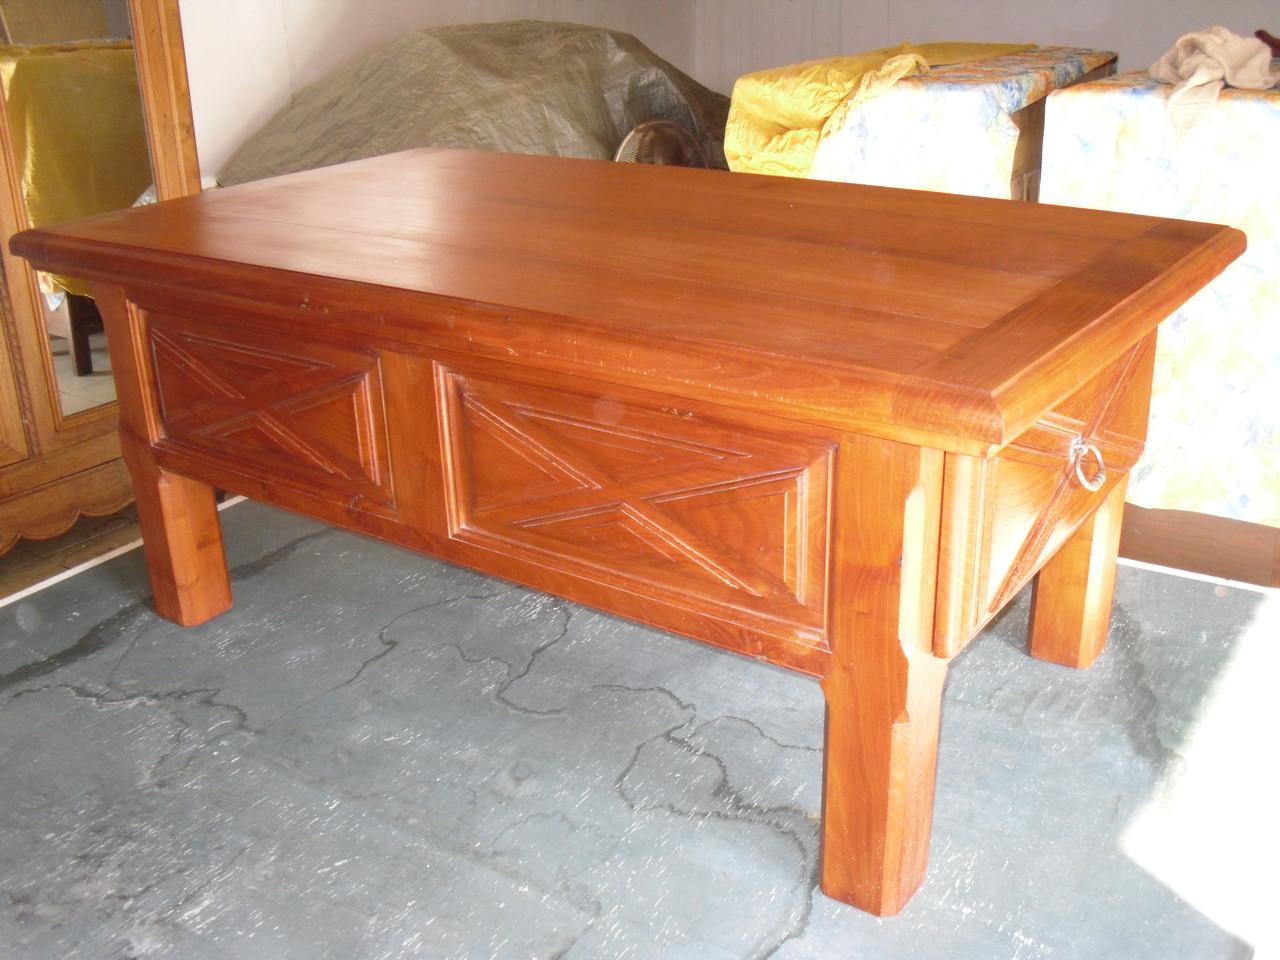 Ebénisterie, Table basse en Cerisier